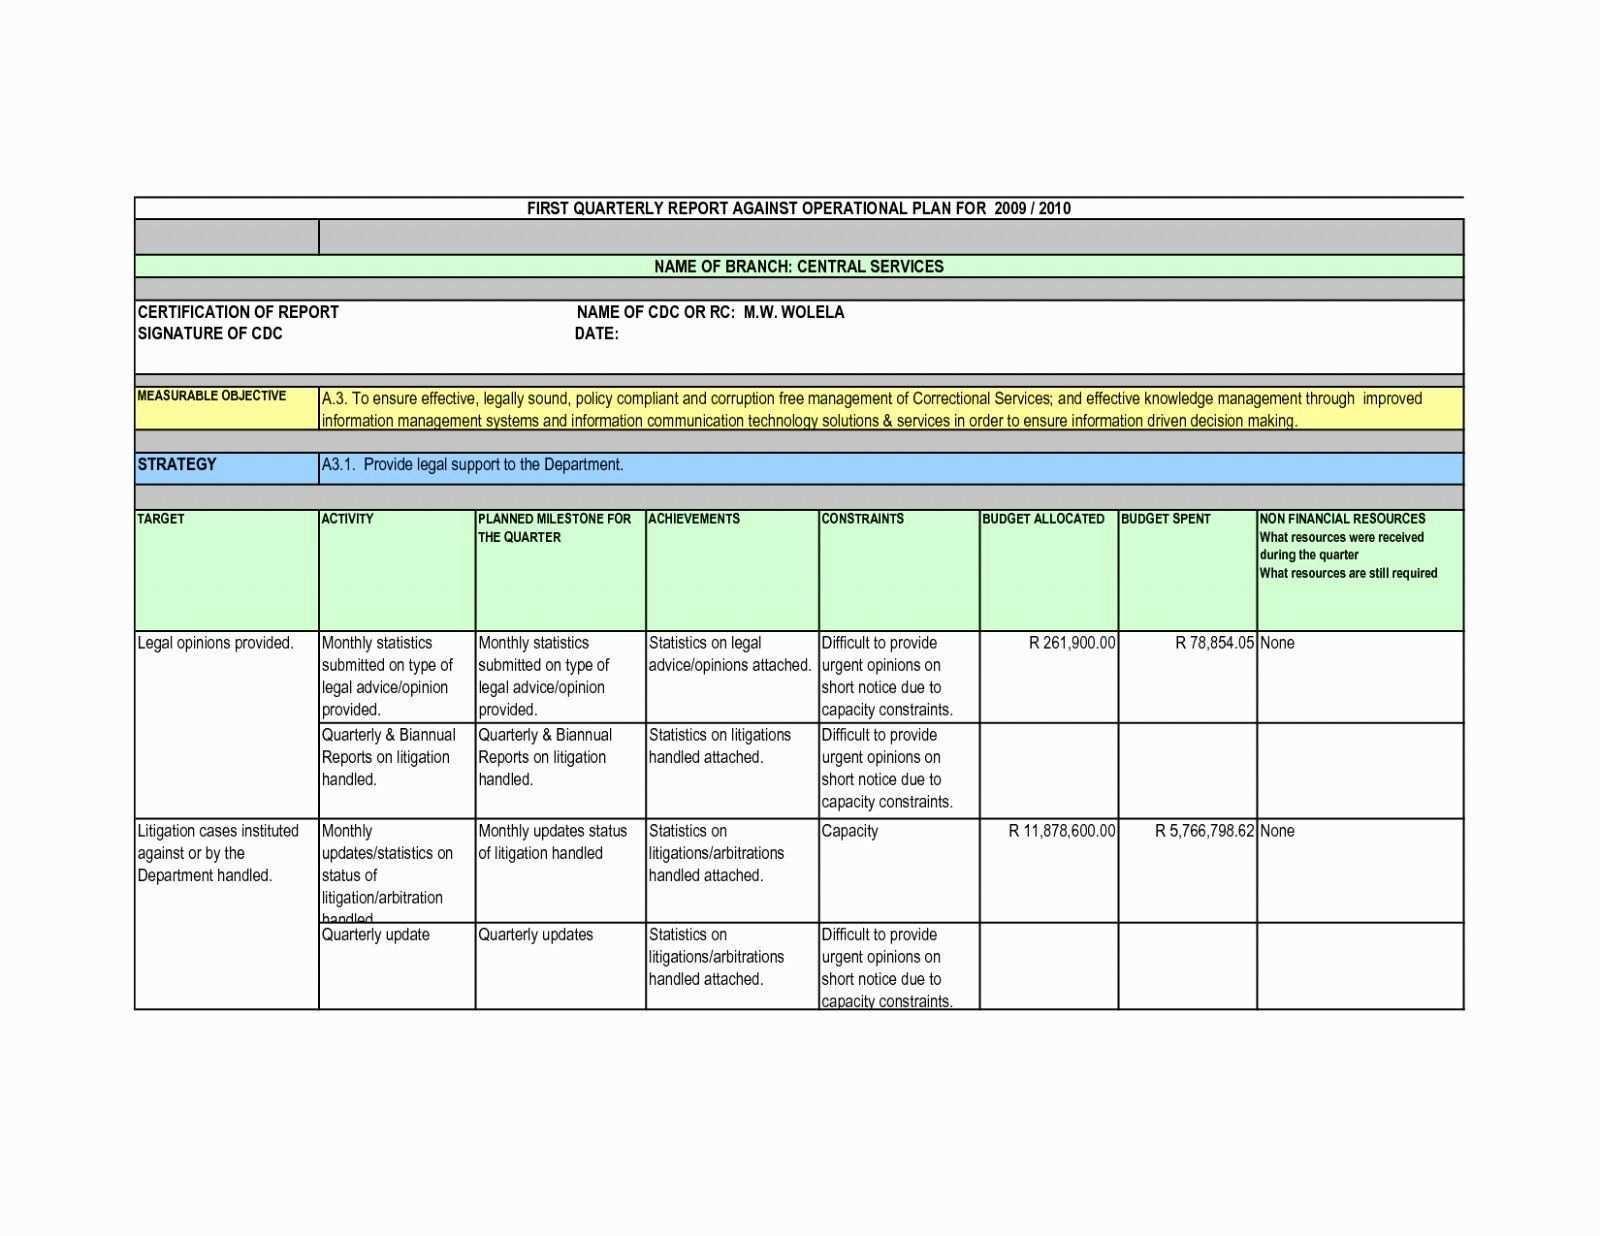 Asbest Betriebs Und Wartungsplan Vorlage Lovely 013 Plan Template Busin Asbestbetrieb In 2020 How To Plan Operation And Maintenance Home Maintenance